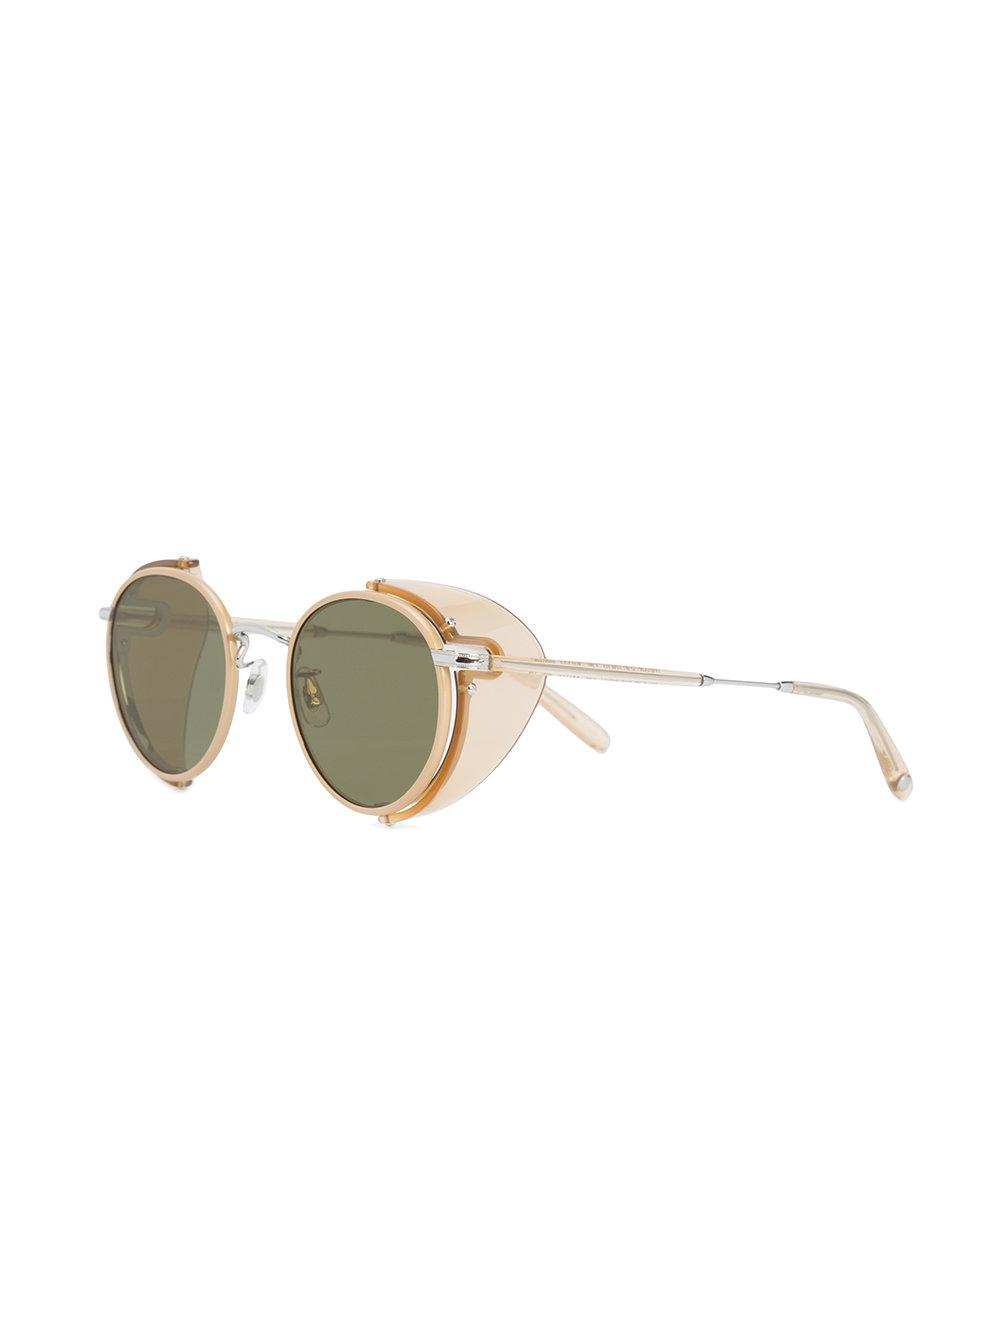 8e4ff11faa5 Lyst - Garrett Leight Wilson Sun Shield Sunglasses in Green for Men